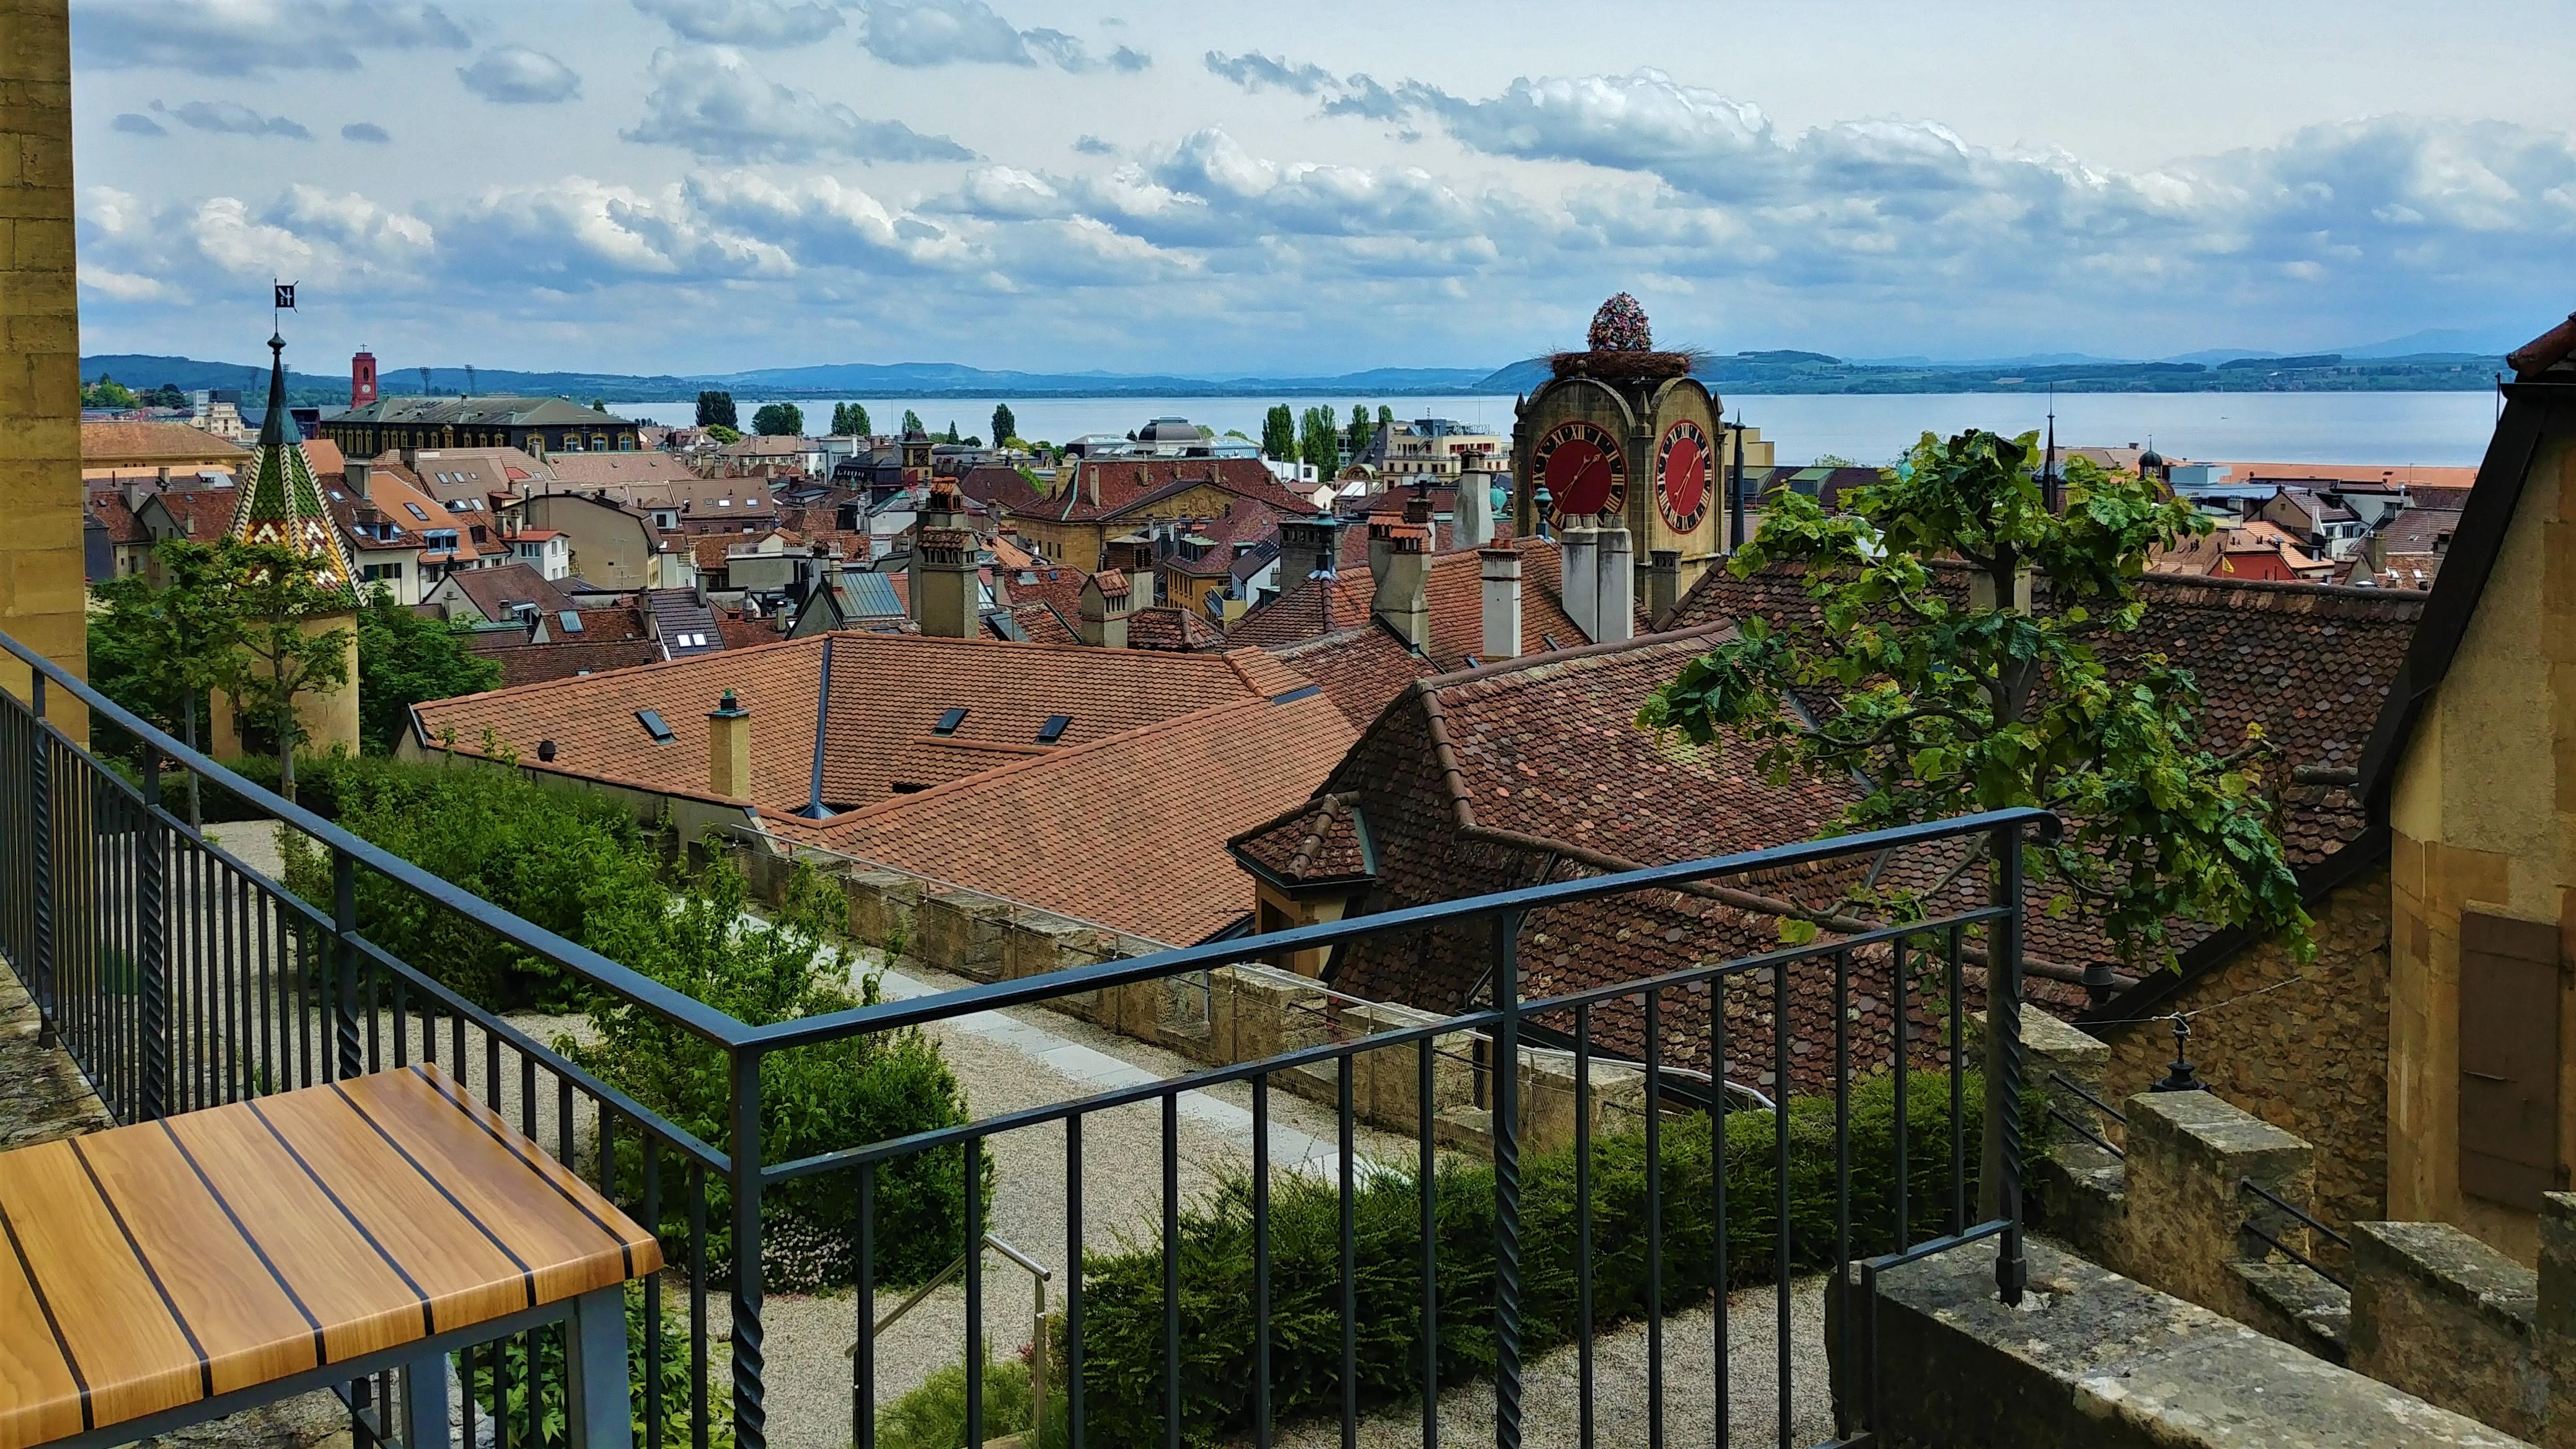 Neuchatel canton visite blog voyage suisse arpenter le chemin